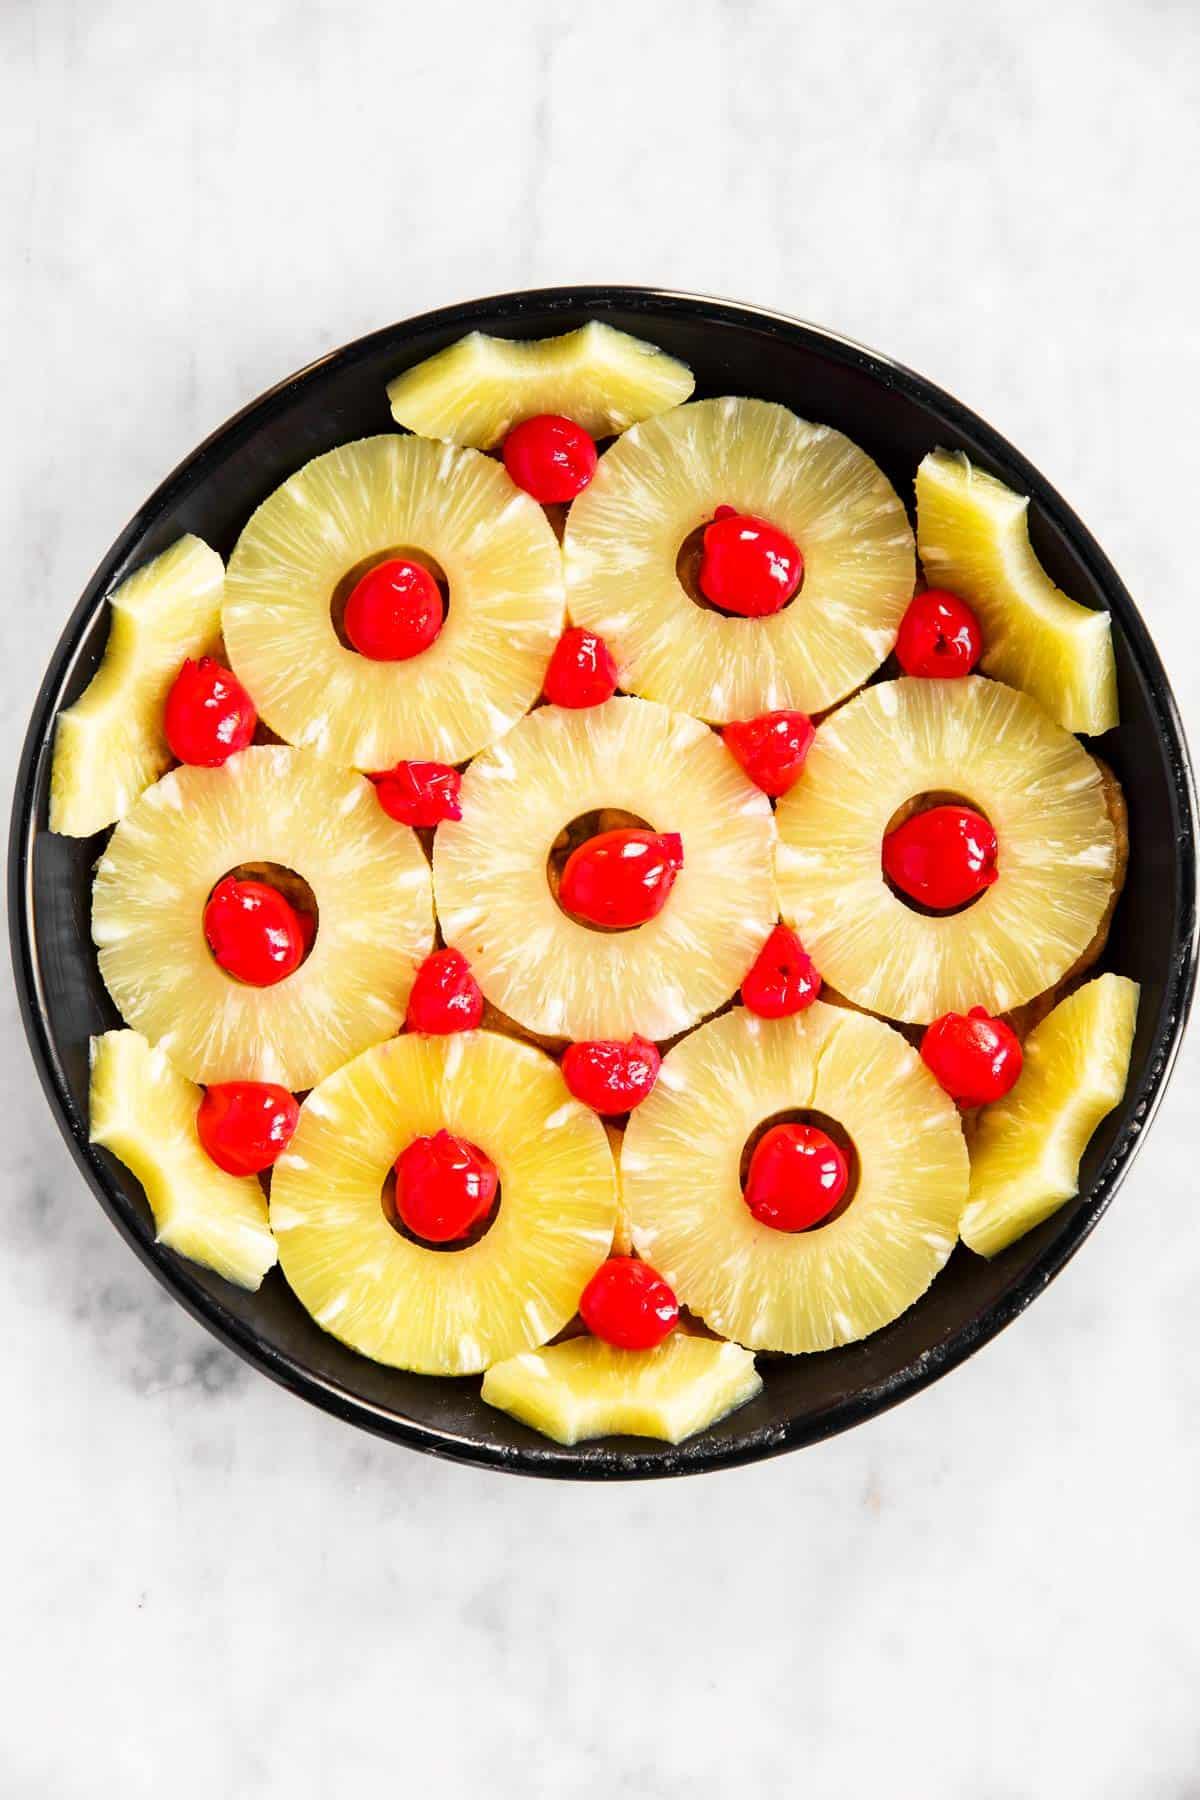 black cake pan lined with pineapple rings and maraschino cherries